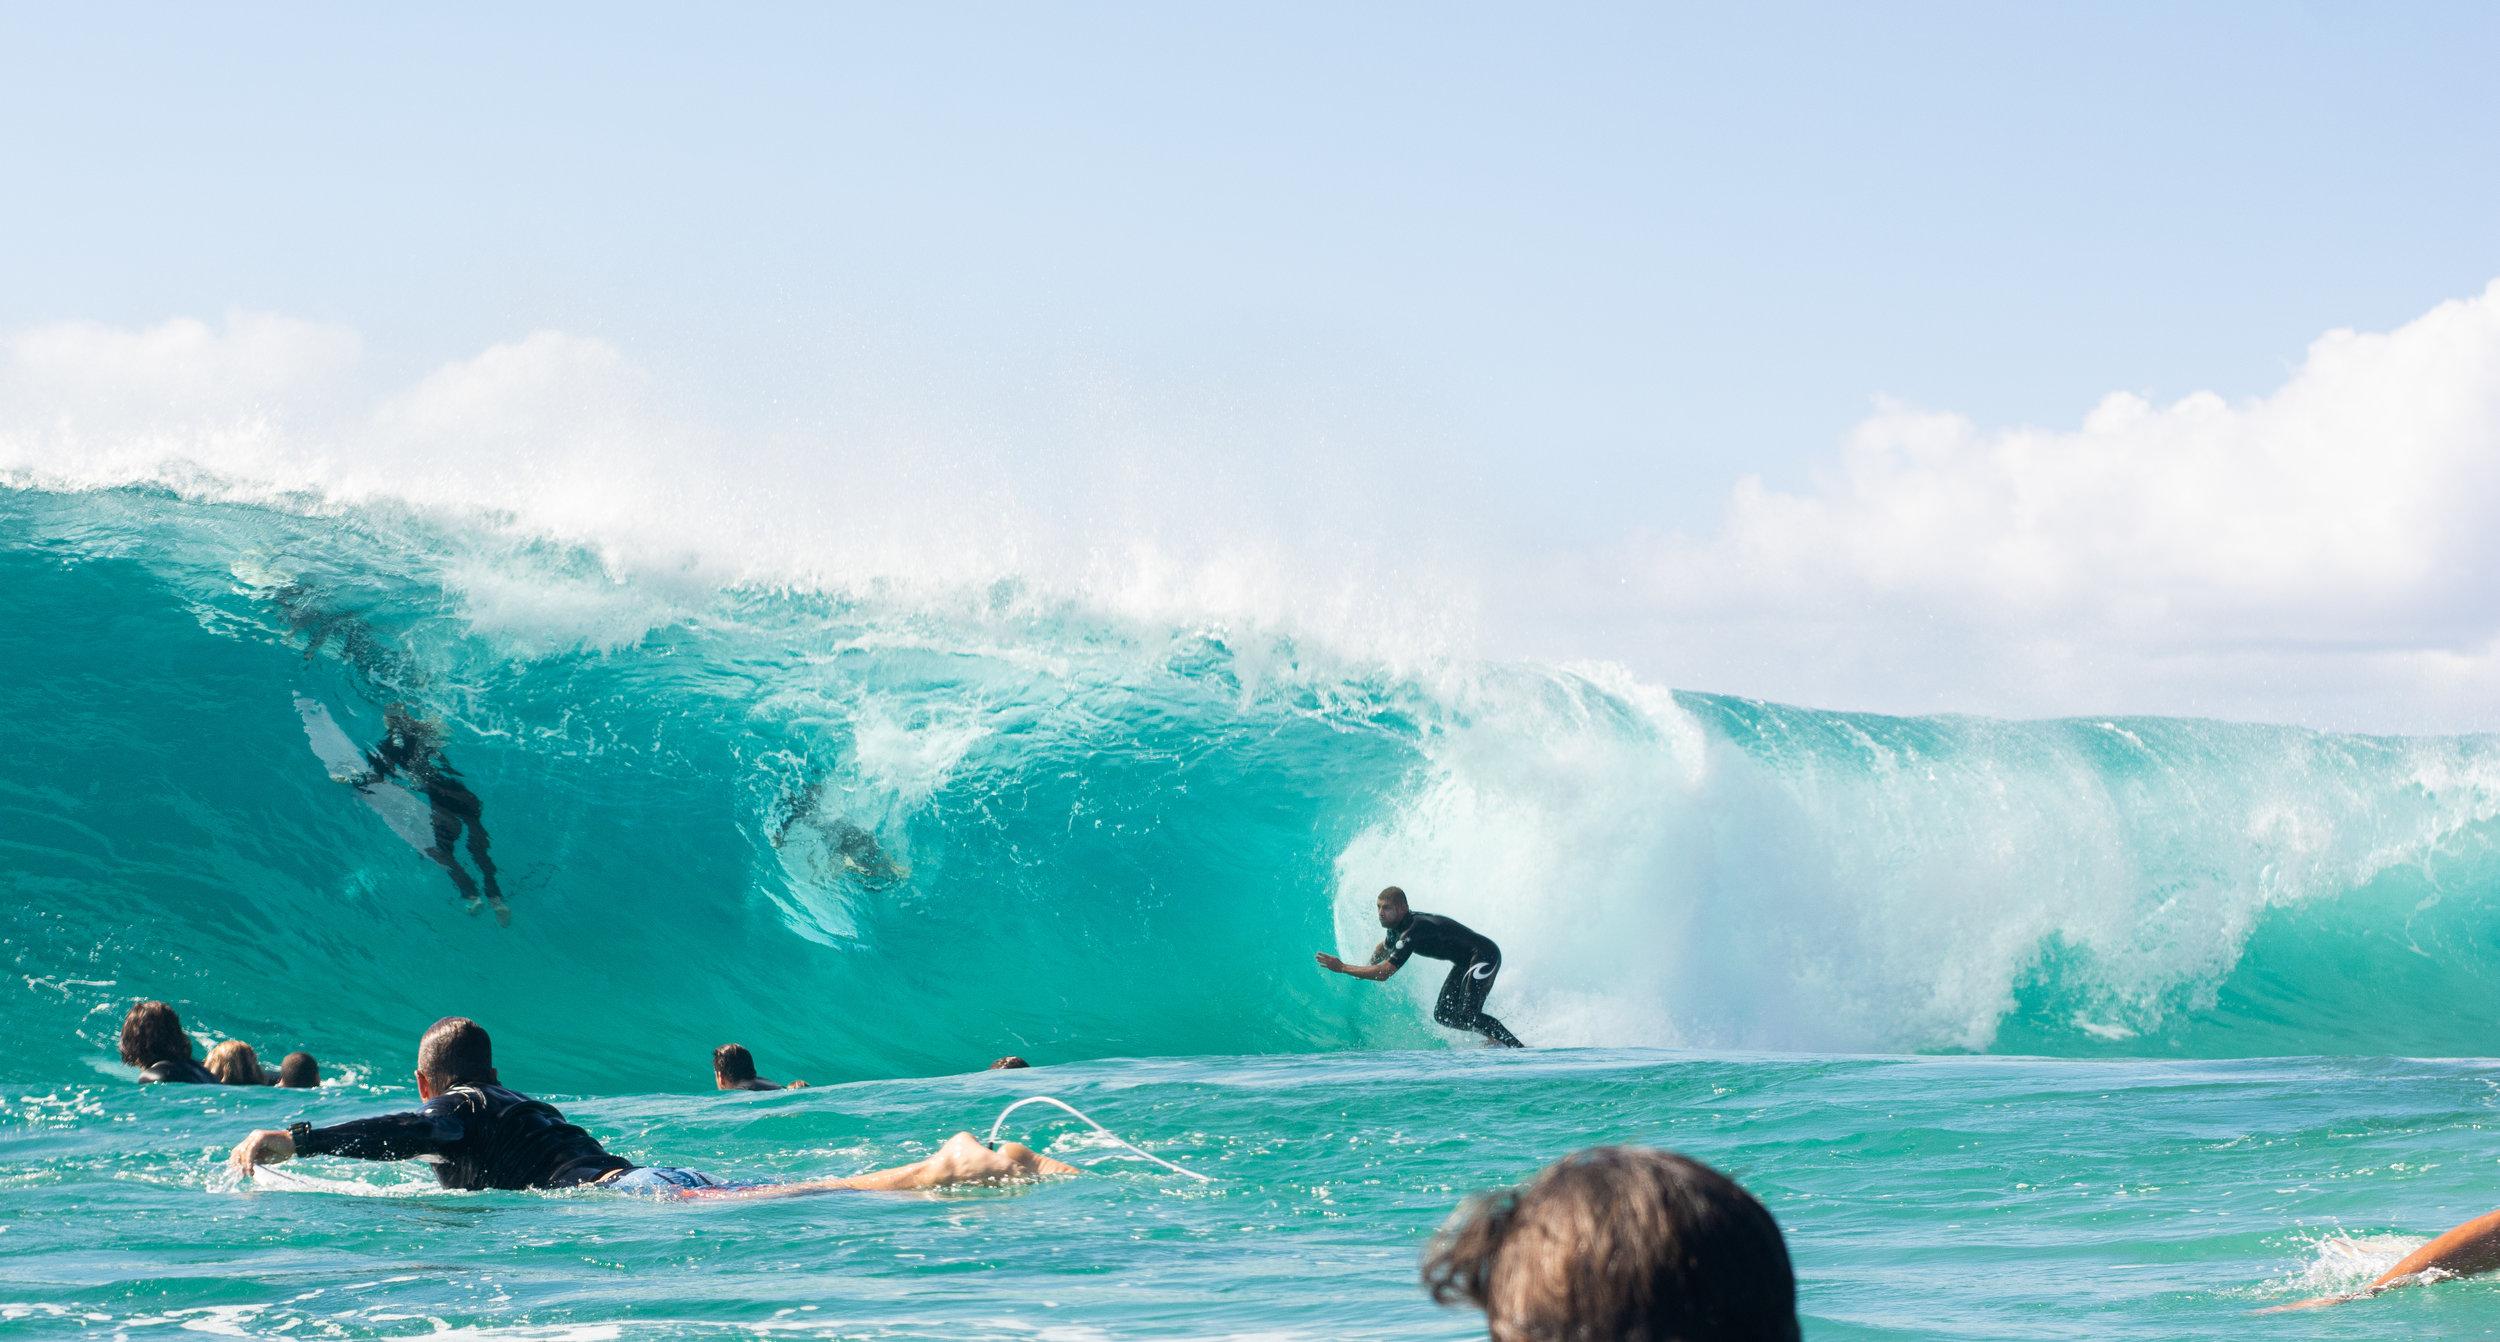 snapper_rocks_australia_saltwater_3